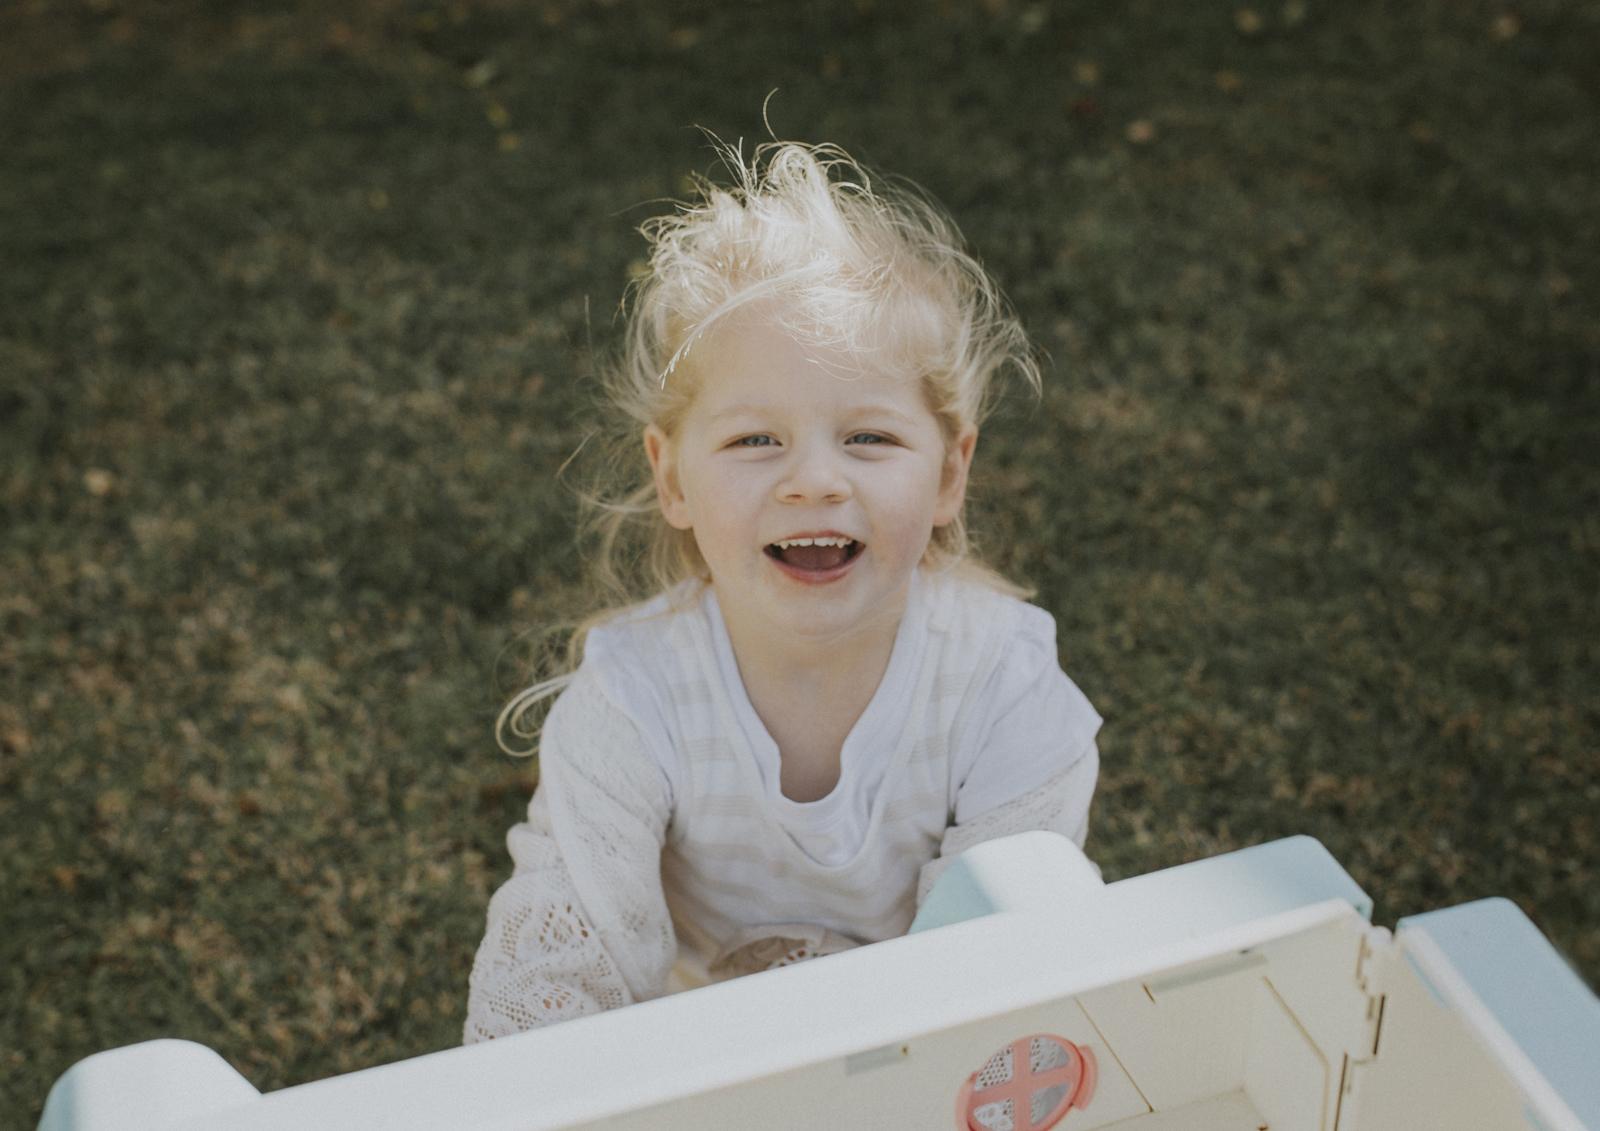 Child Photographer Bayside Melbourne